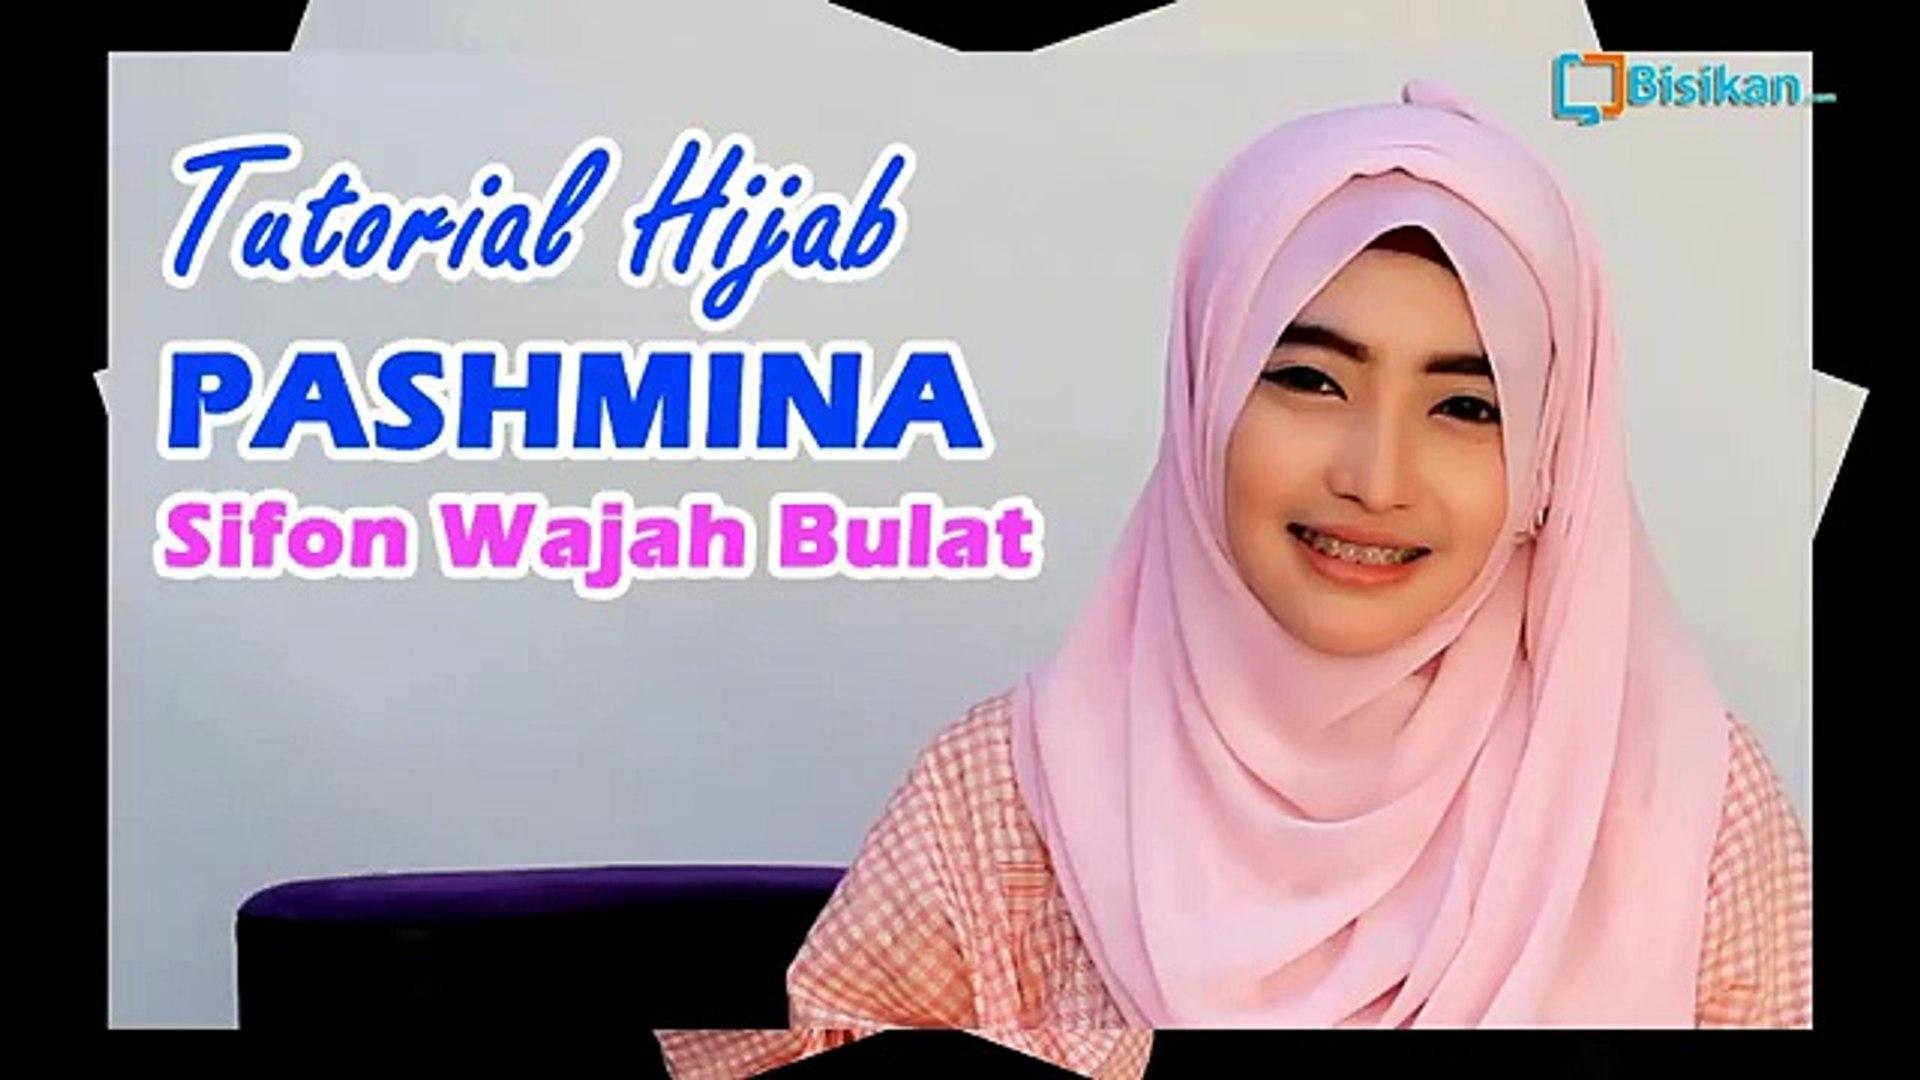 Tutorial Hijab Pashmina Sifon Wajah Bulat Video Dailymotion